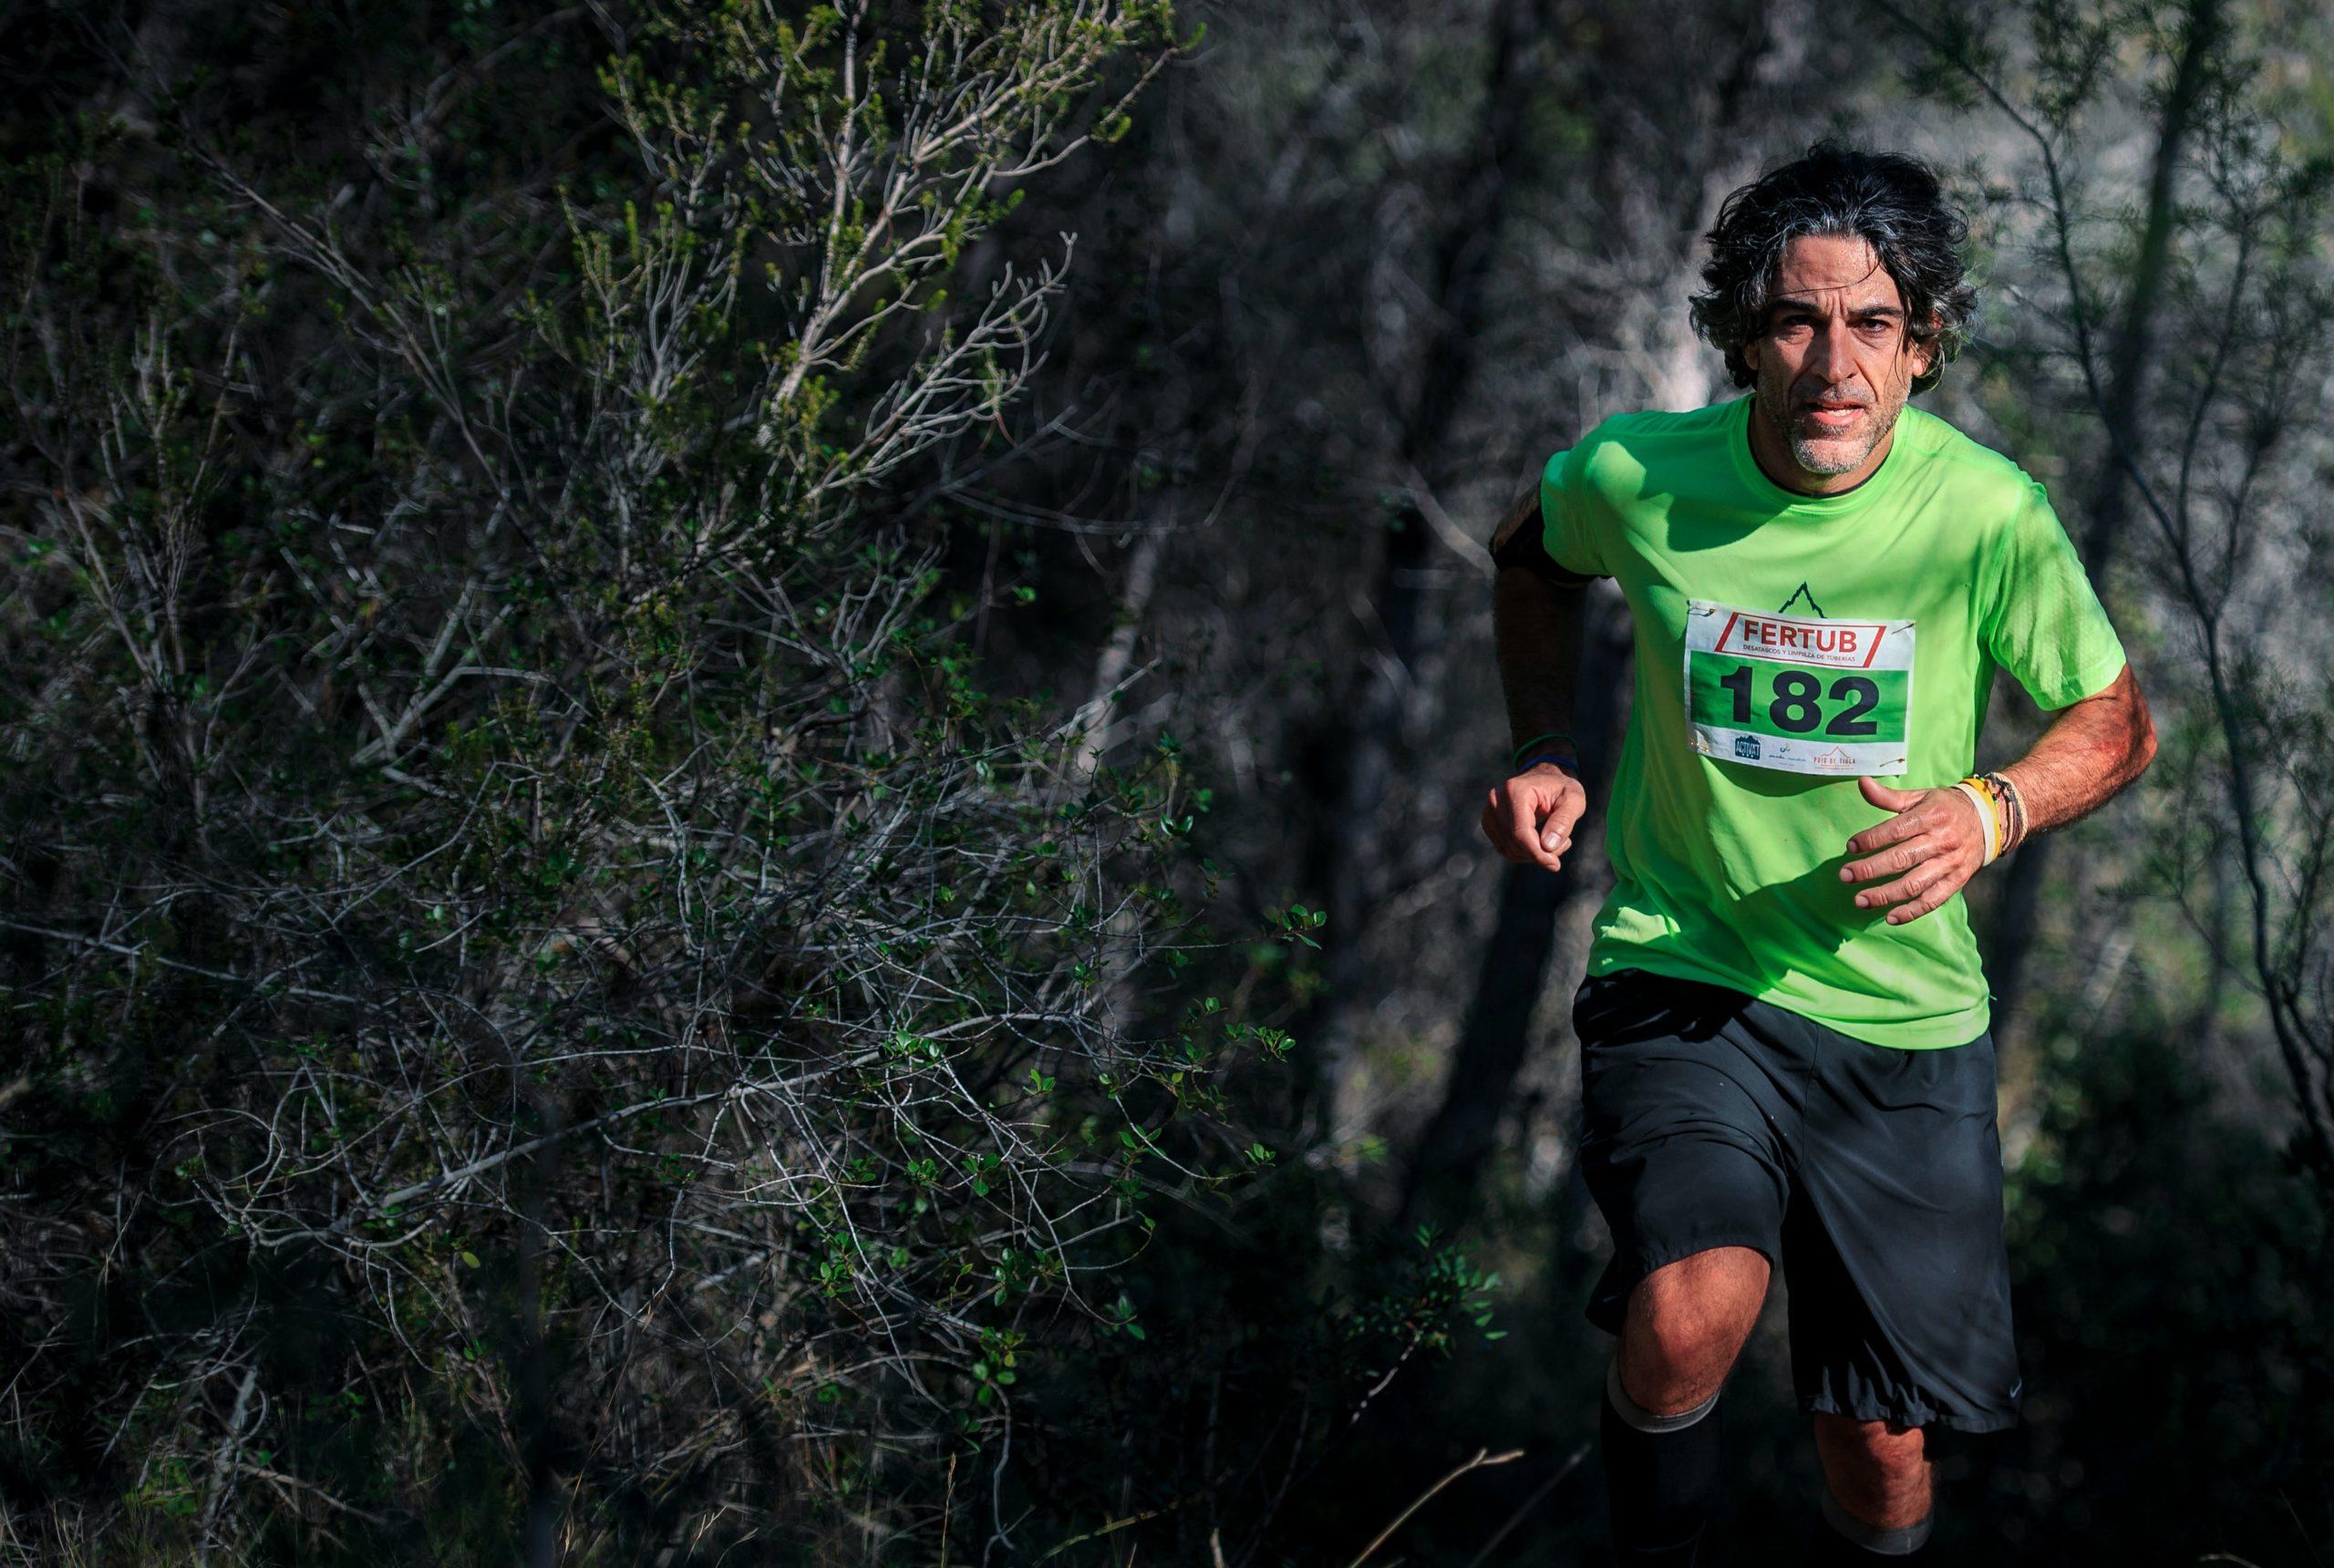 Running Motivation   Own Your Run   #ownyourrun